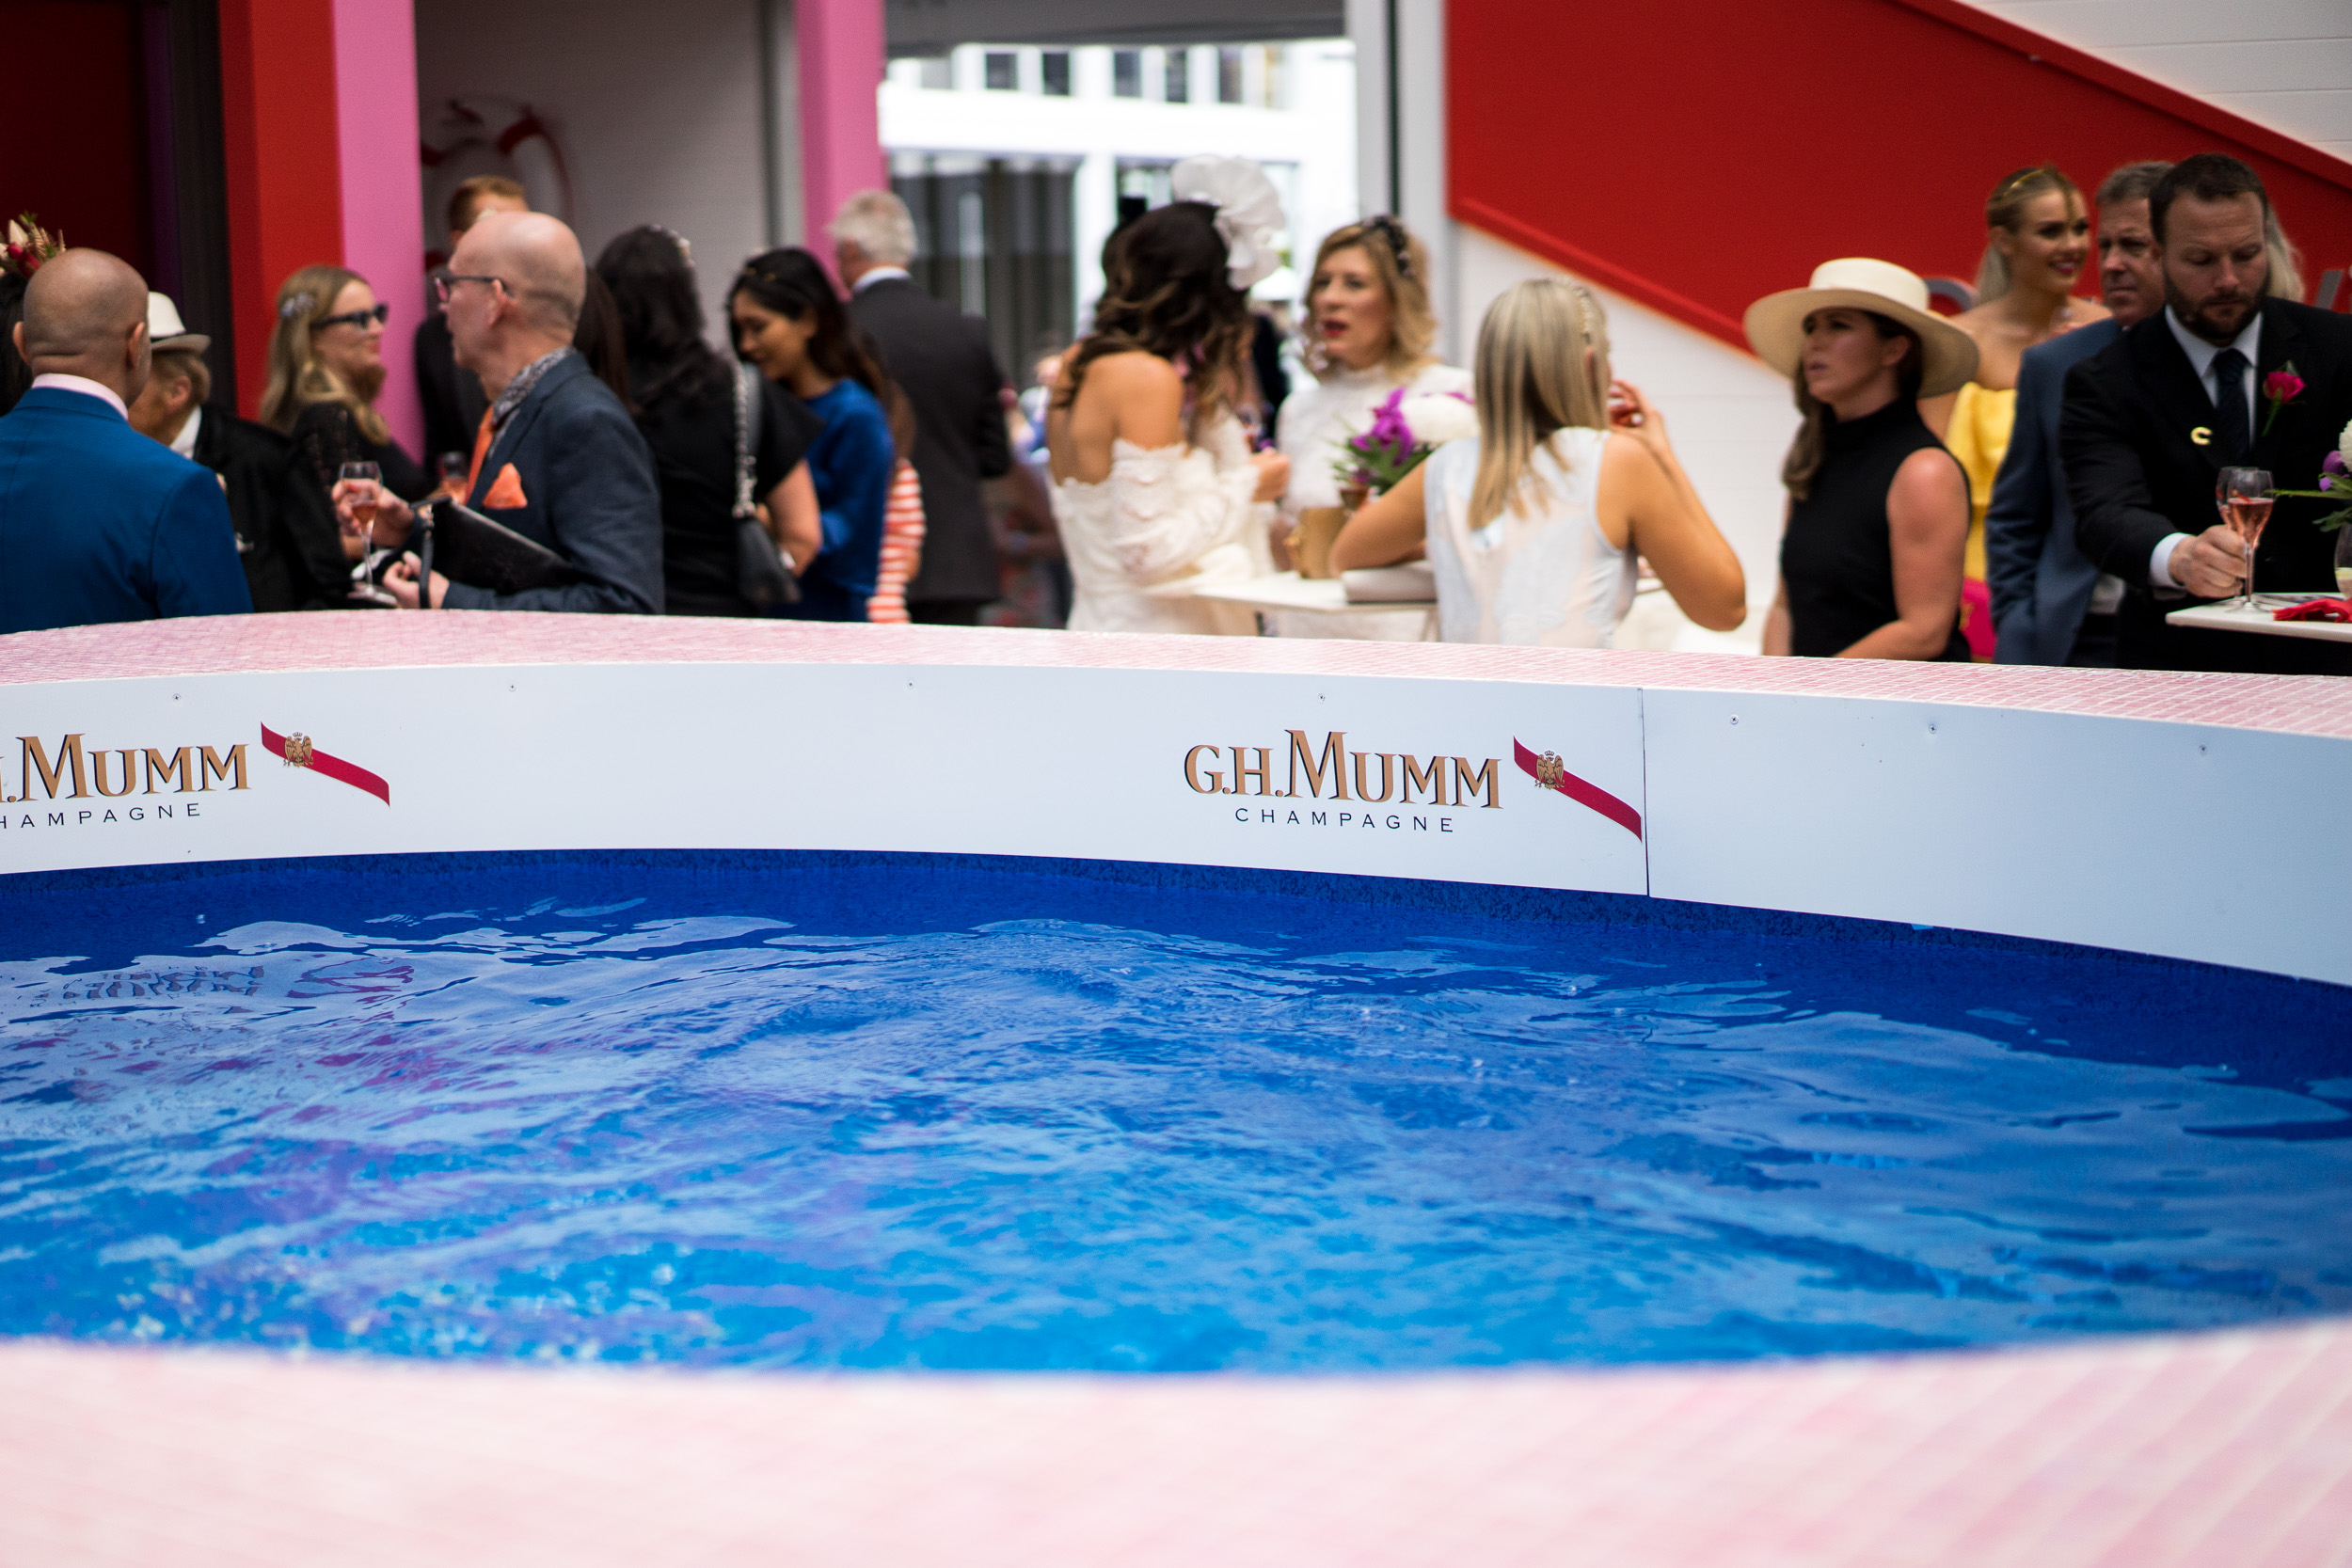 ghmumm-roddgunn-melbourne-spring-carnival5